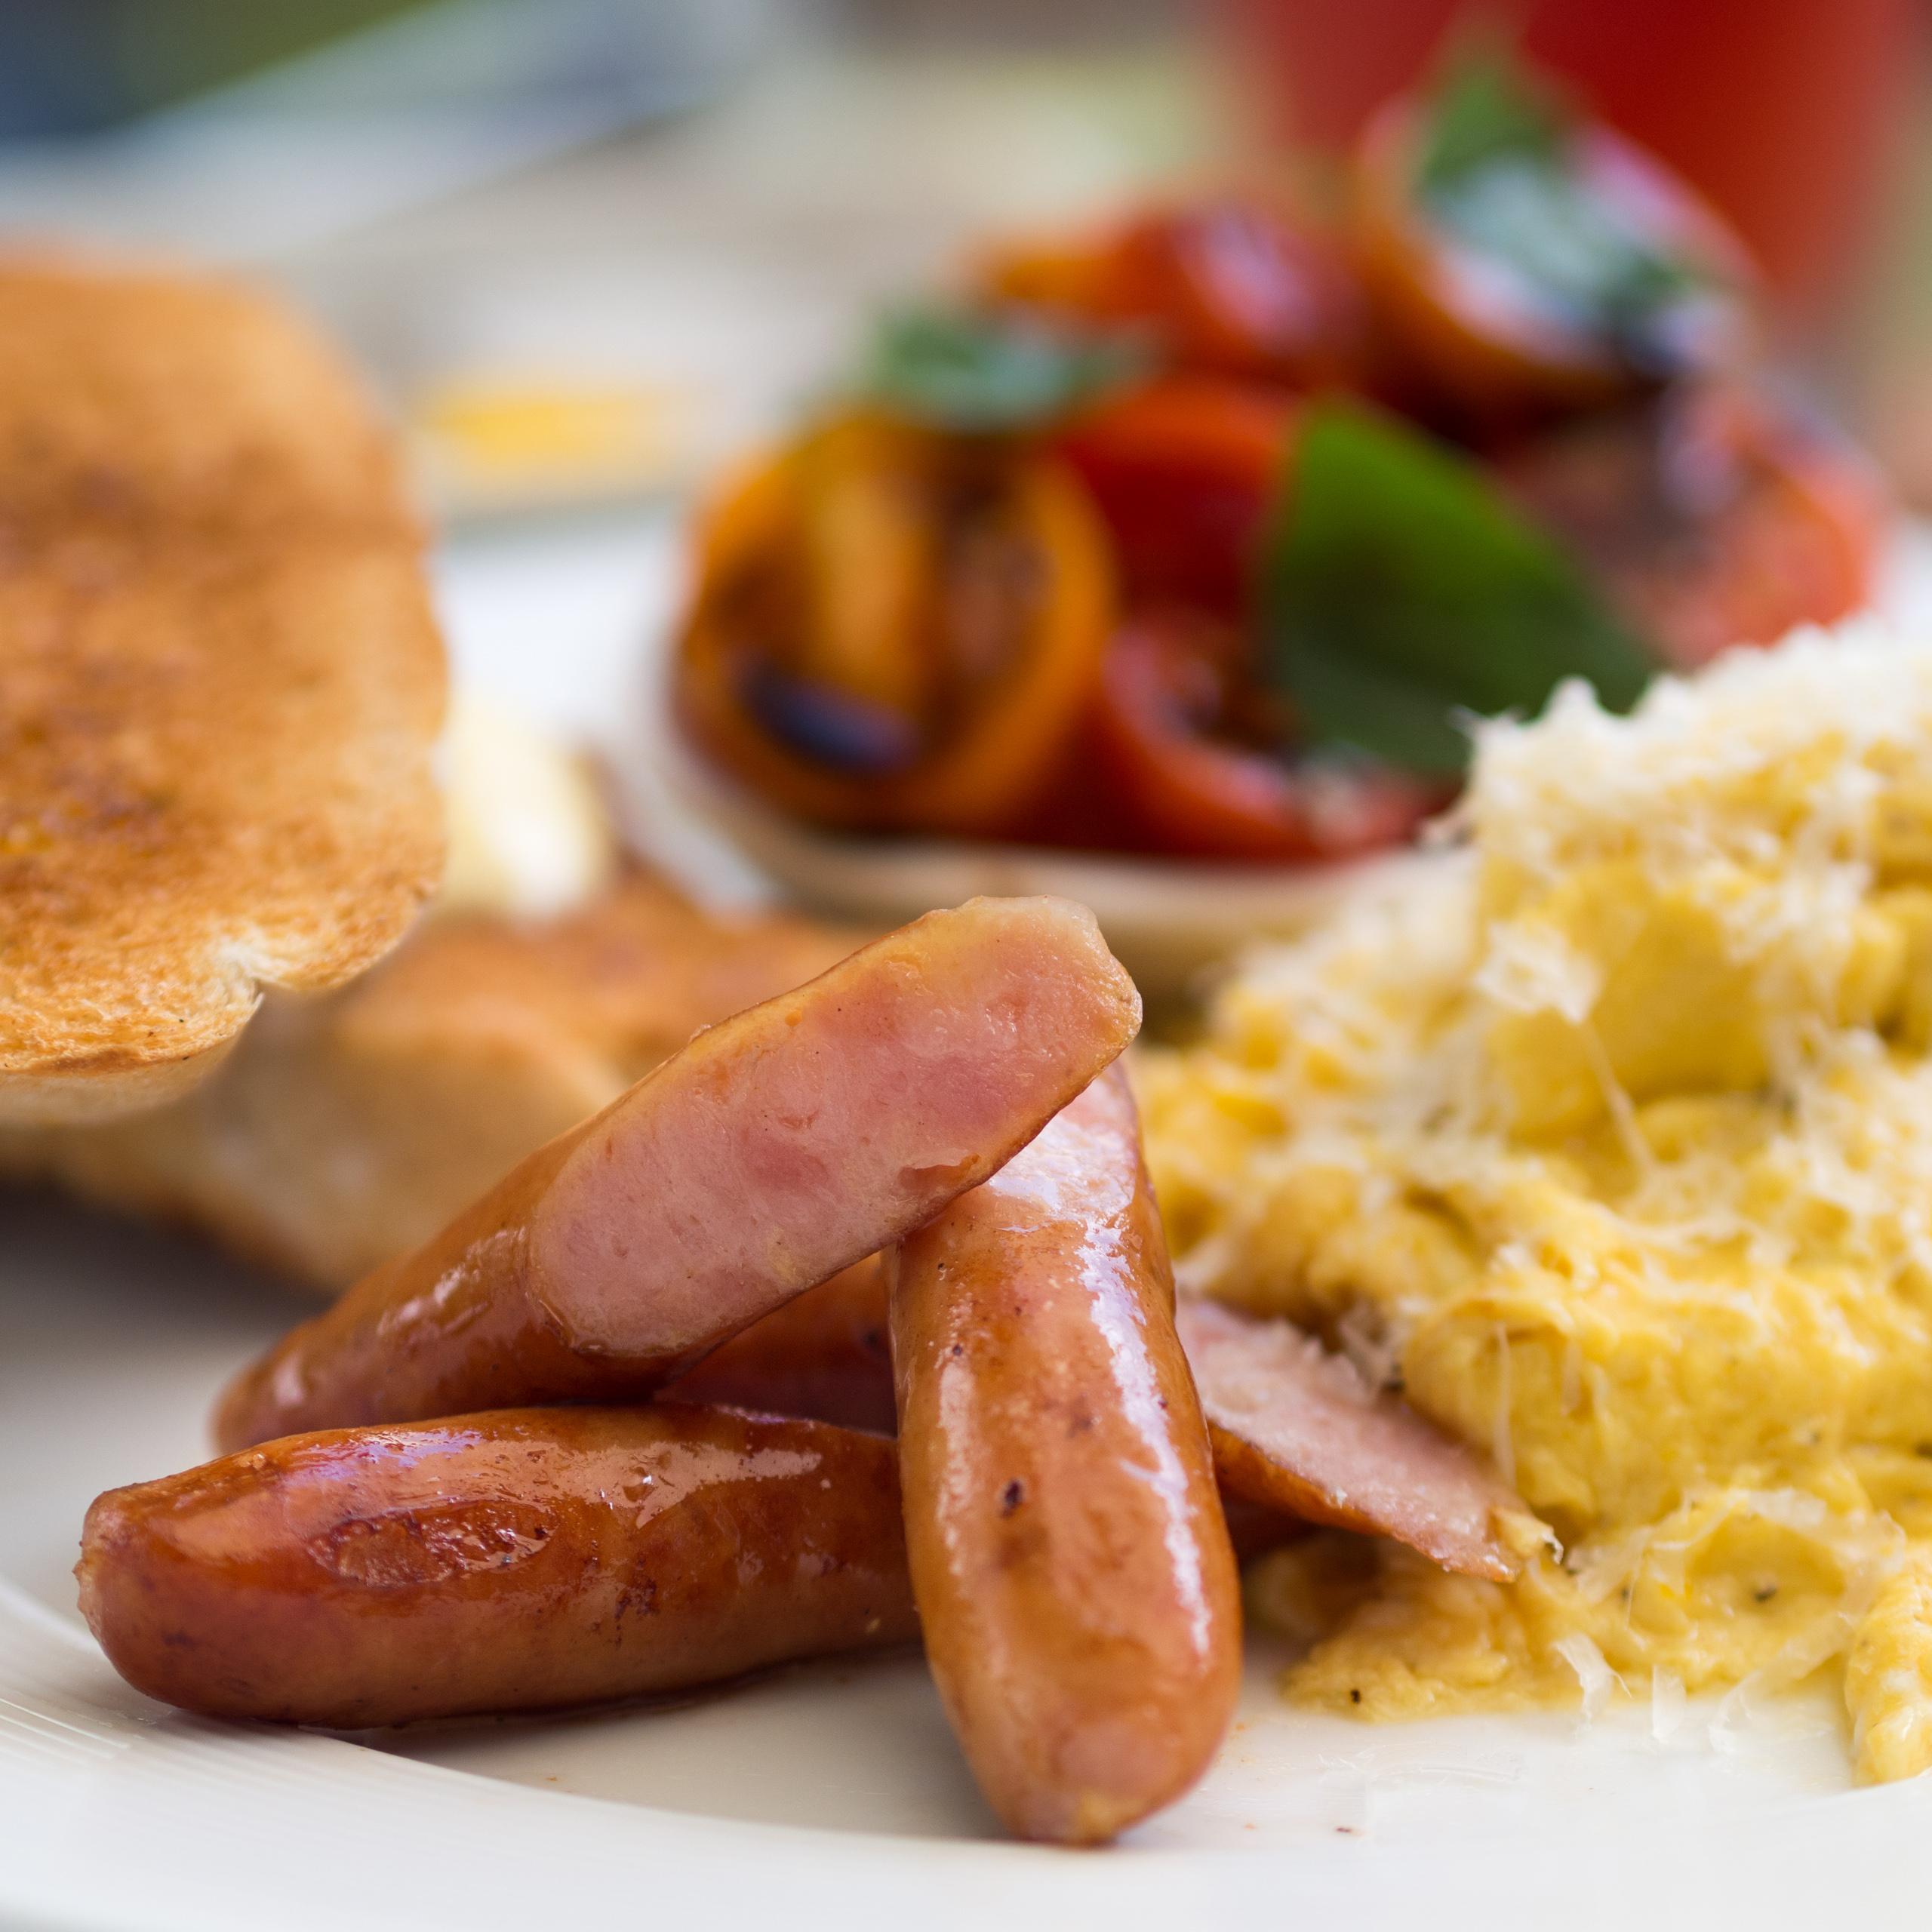 File:Arabiki sausages scrambled eggs Chiang Mai.jpg - Wikimedia Commons